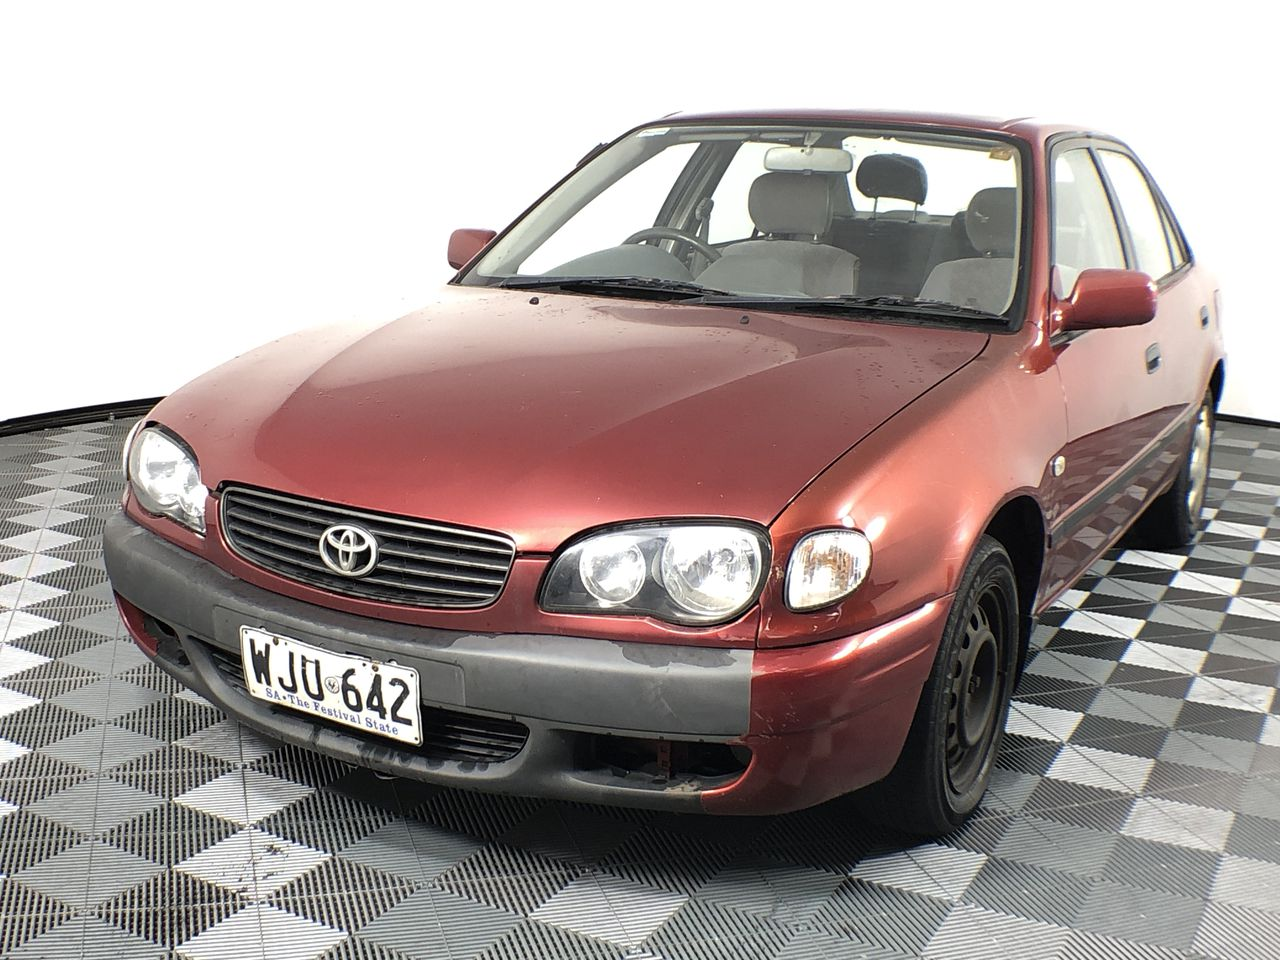 2000 Toyota Corolla Ascent Automatic Sedan